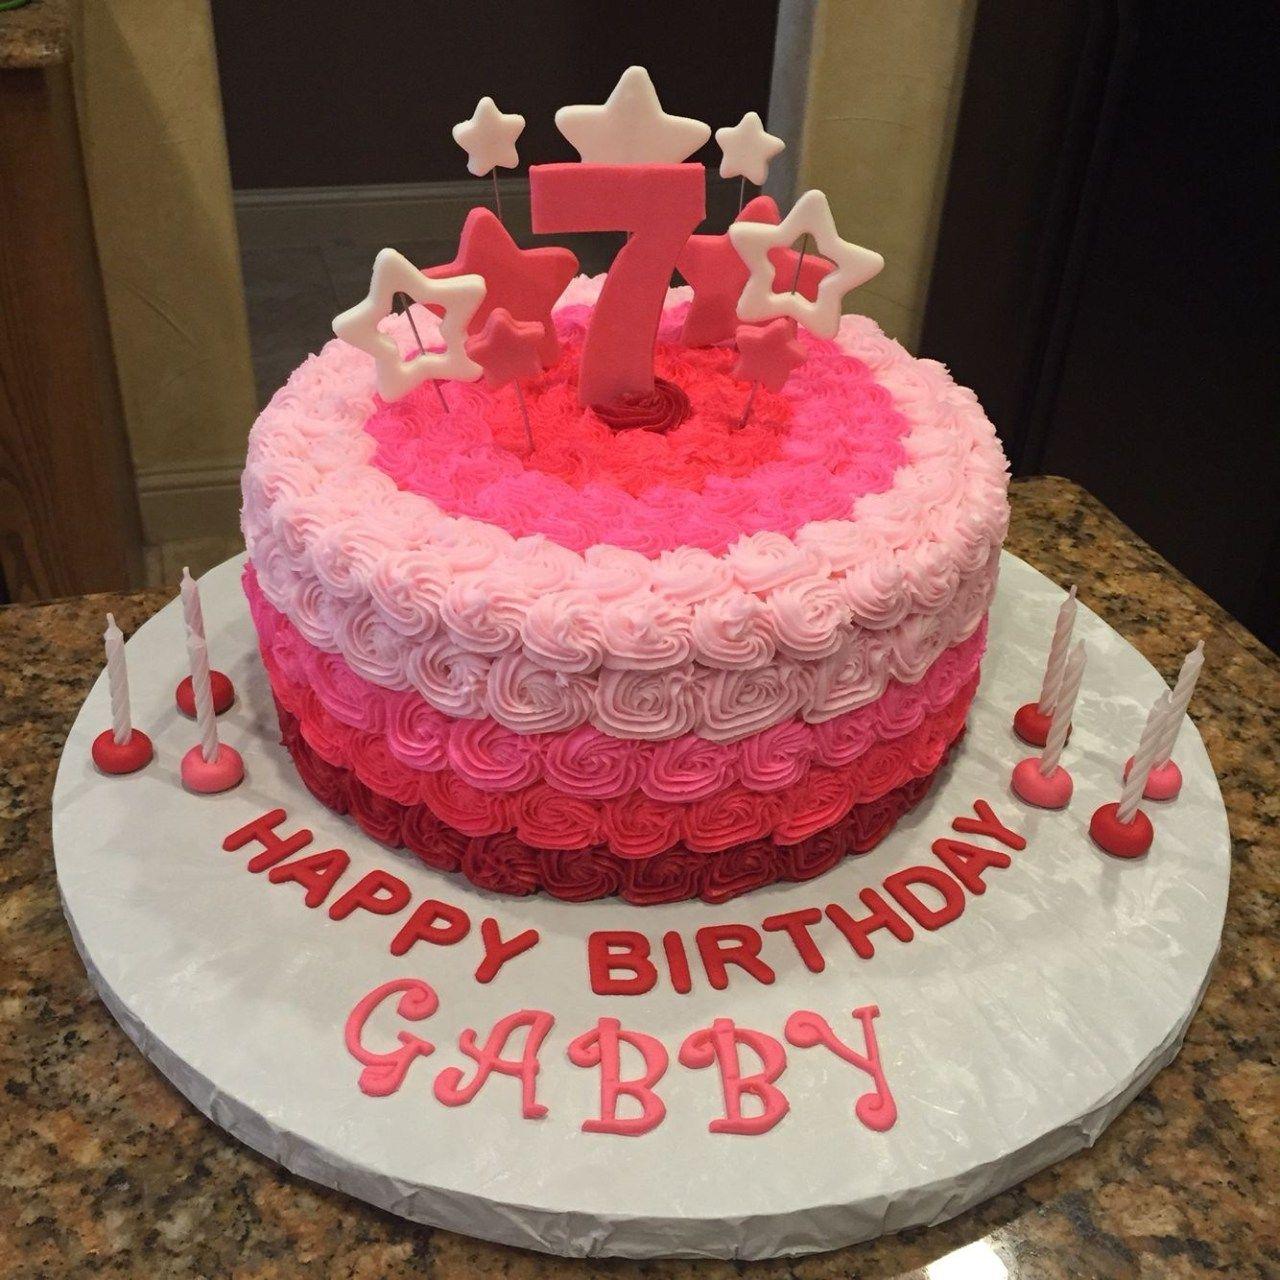 Stupendous American Girl Birthday Cake American Girl Doll Birthday Cake My Personalised Birthday Cards Paralily Jamesorg